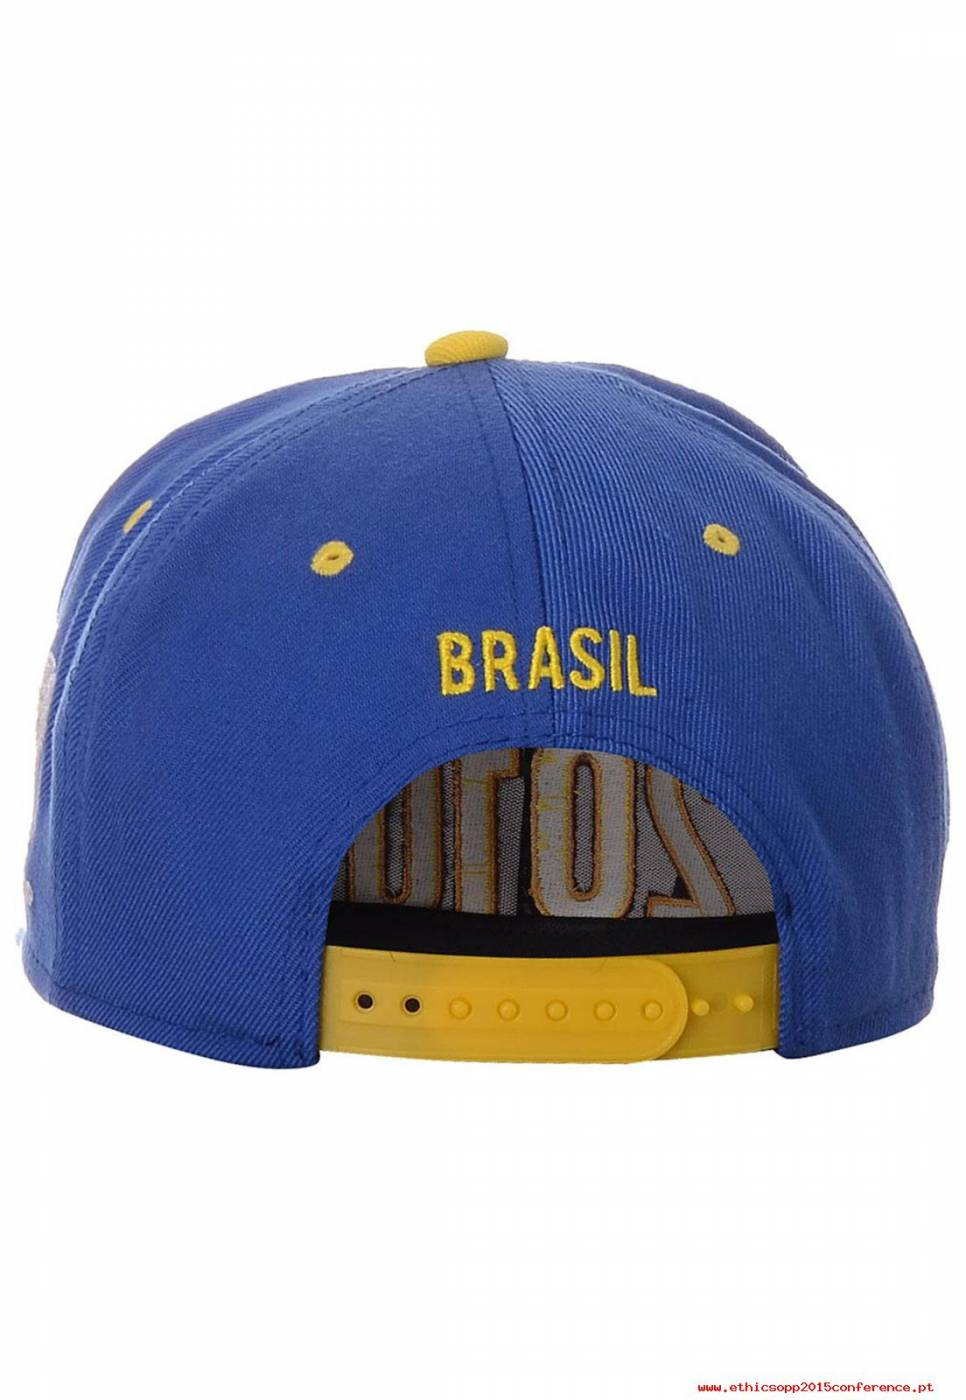 Boné Brasil Cup series 2010 FIFA